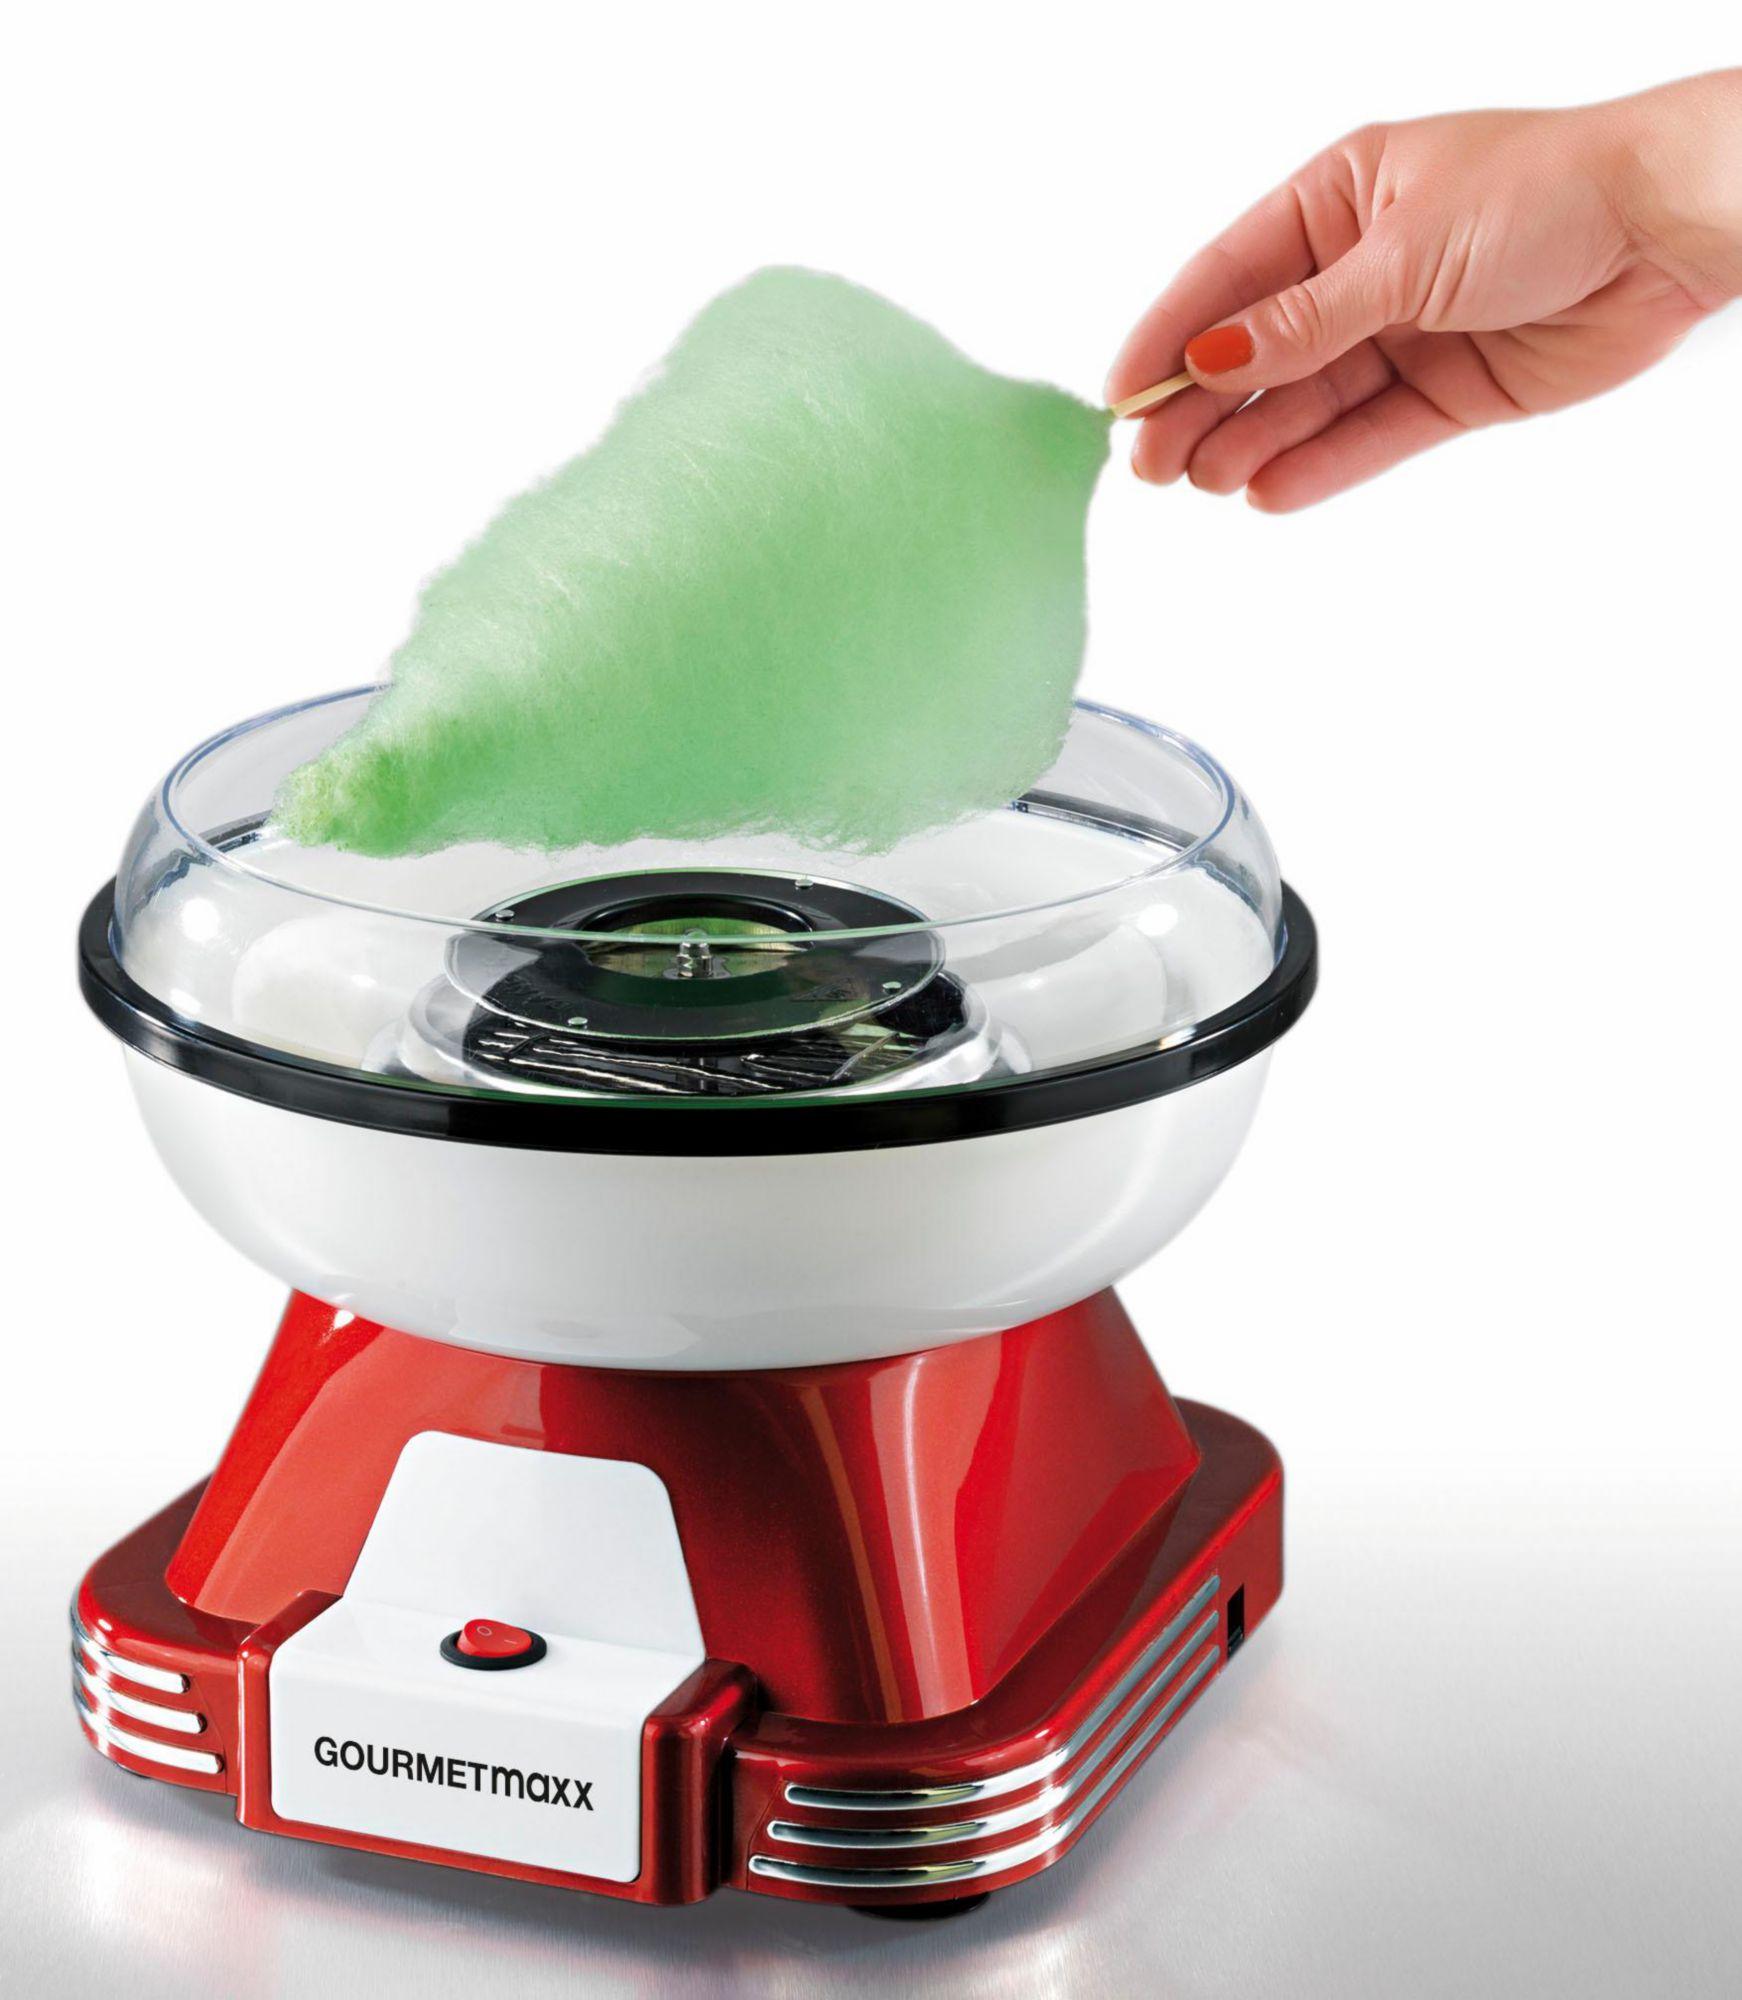 GOURMETMAXX Gourmet Maxx Zuckerwatte-Maschine, 500 Watt, rot/weiß